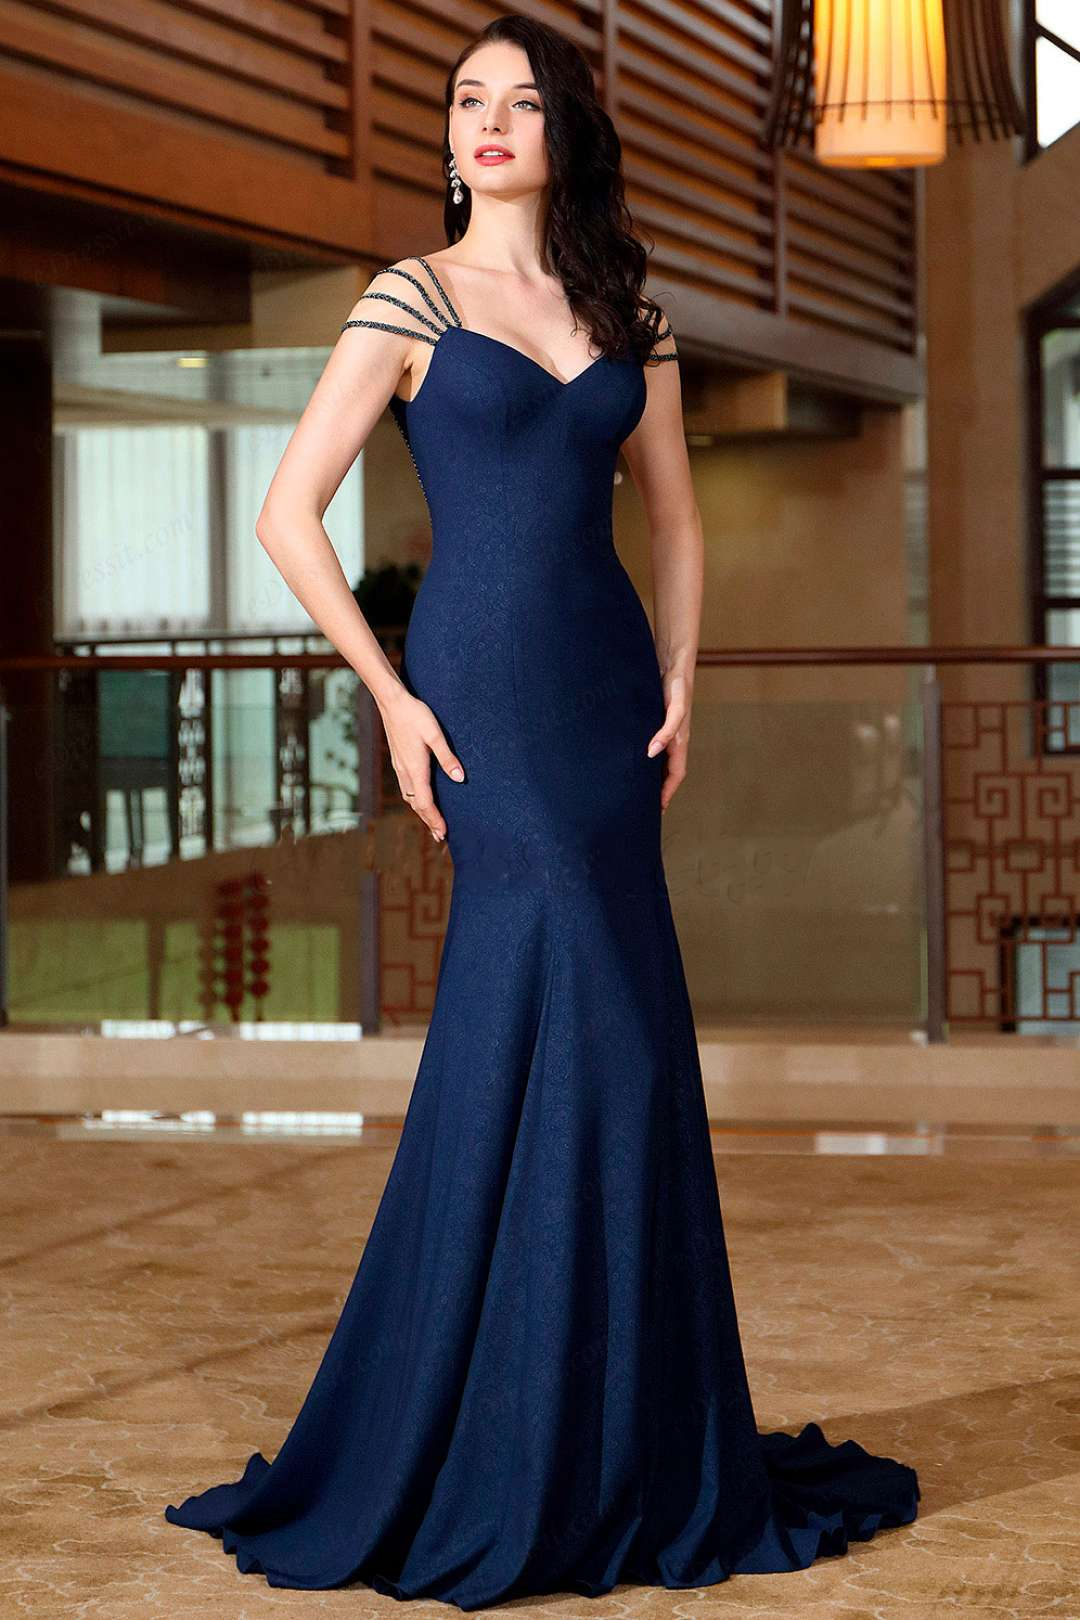 d96ebde2f Vestido de noche azul petroleo - Vestidos elegantes